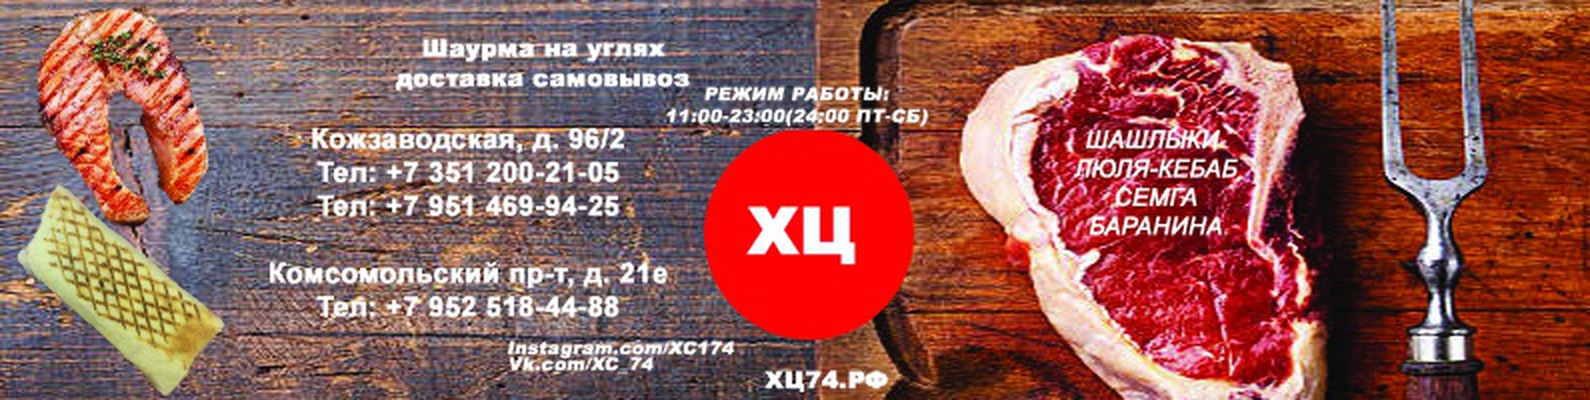 Знаменитый шашлык на Победе - отзыв о Очаг, Челябинск